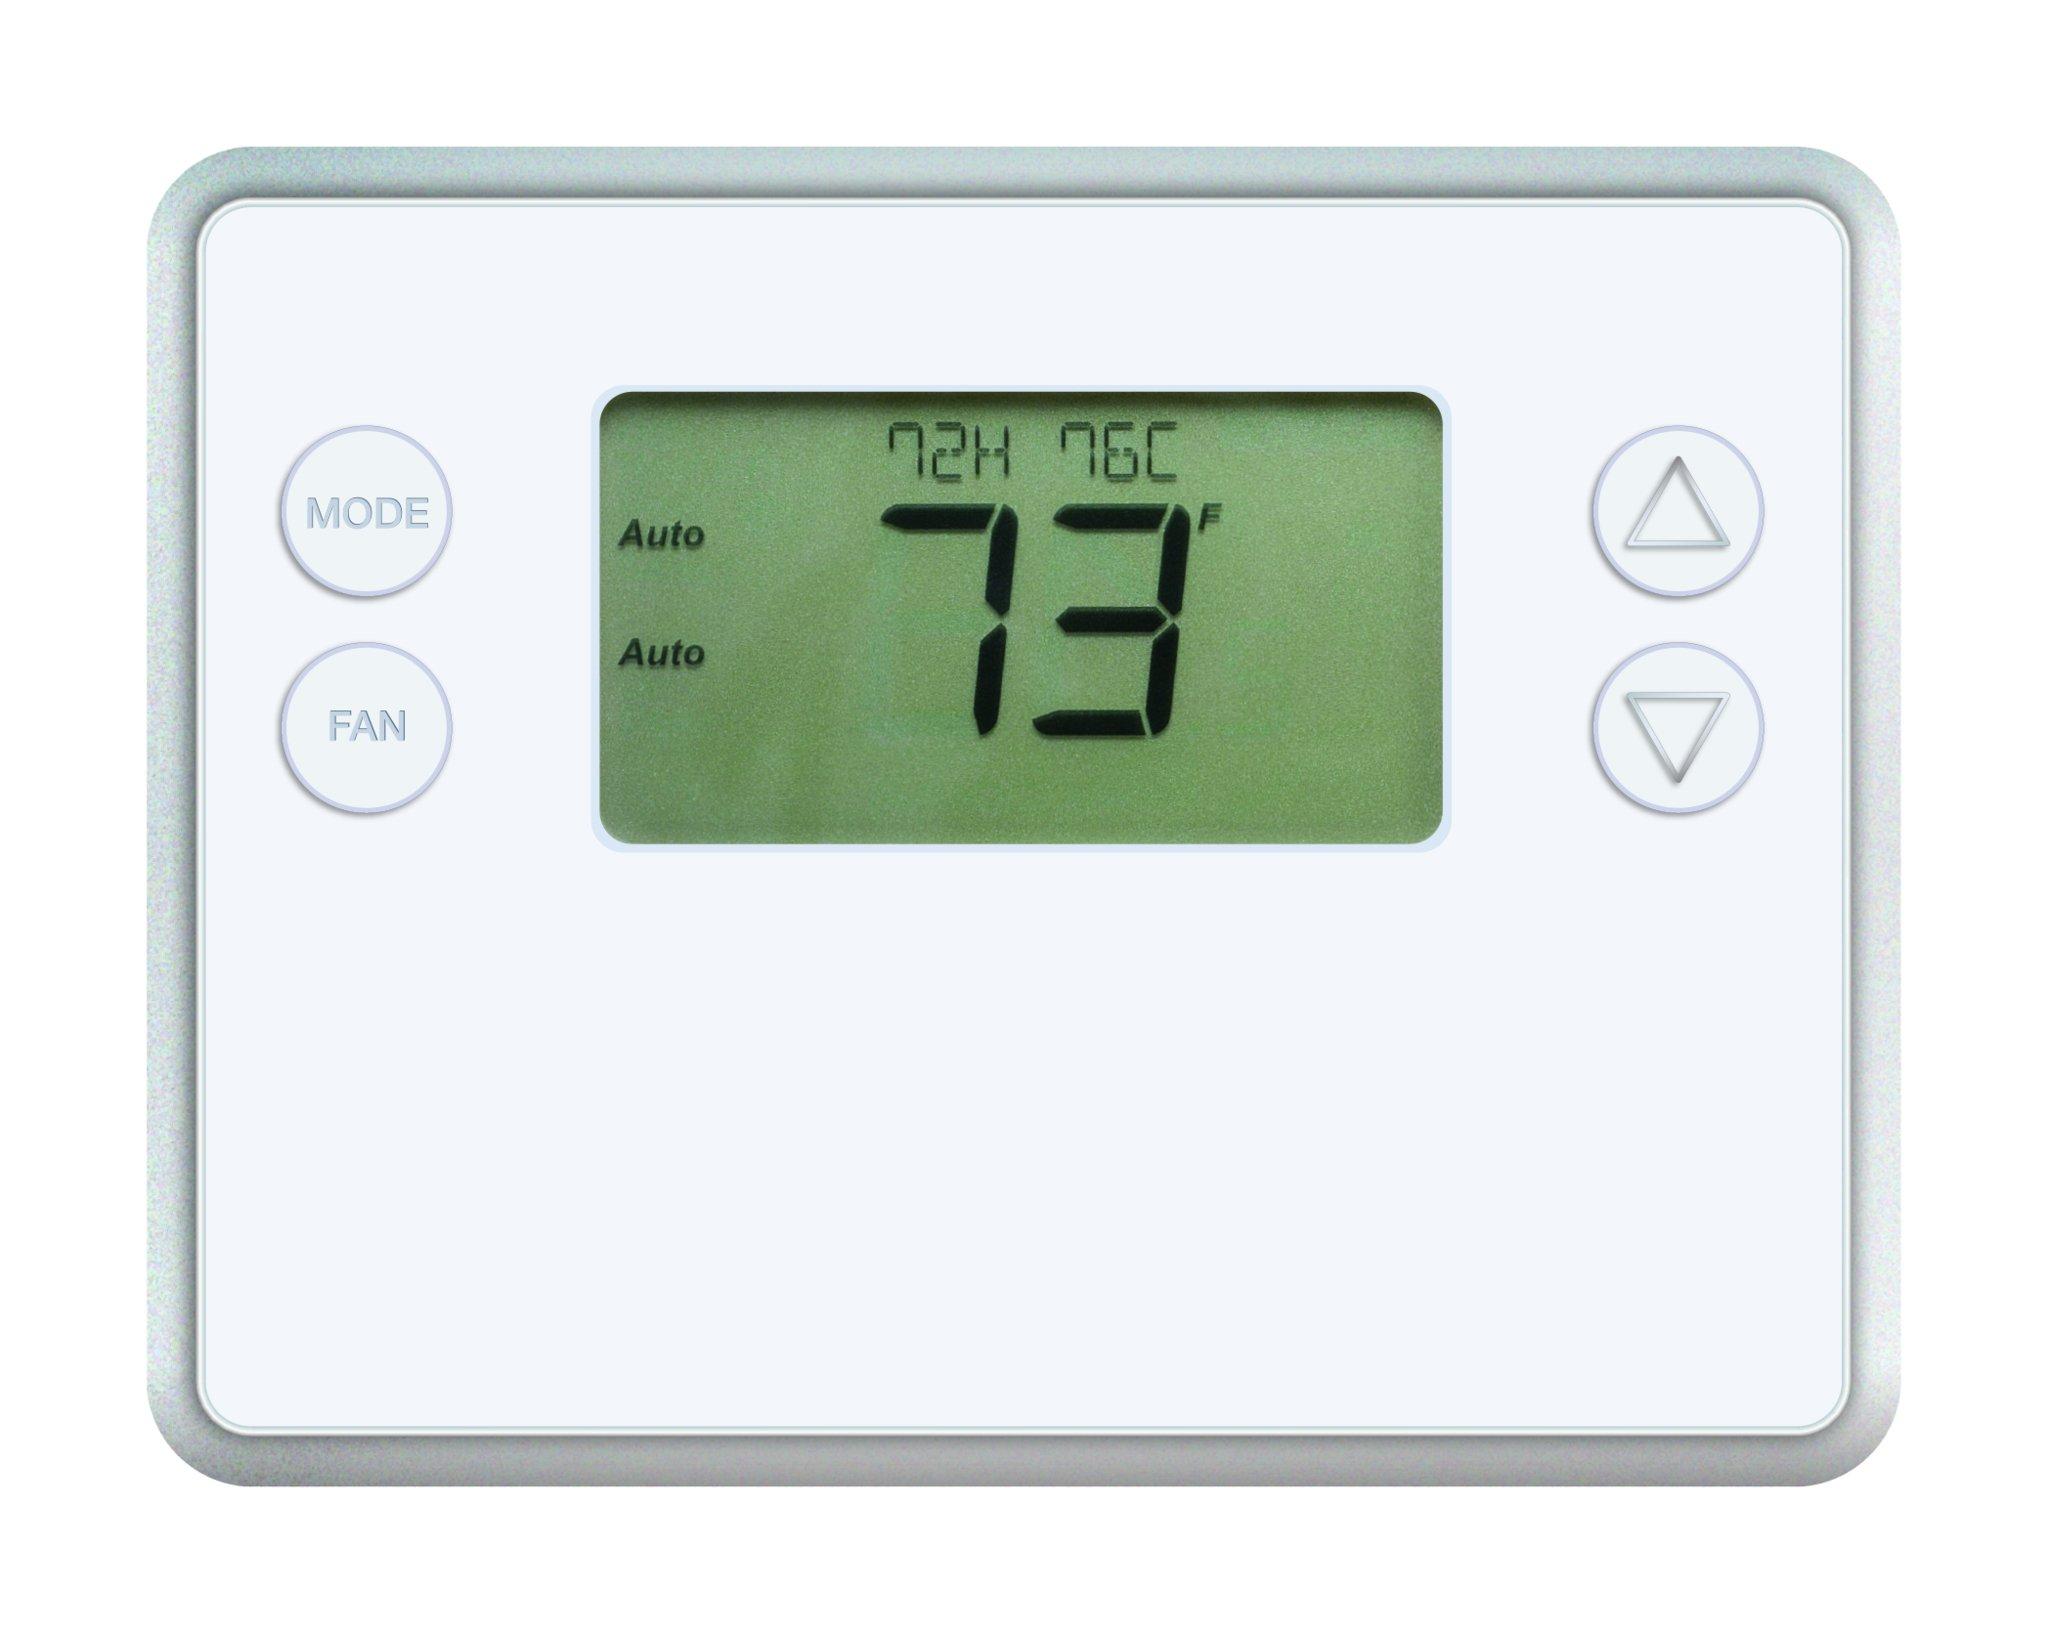 GoControl Z-Wave Battery-Powered Smart Thermostat